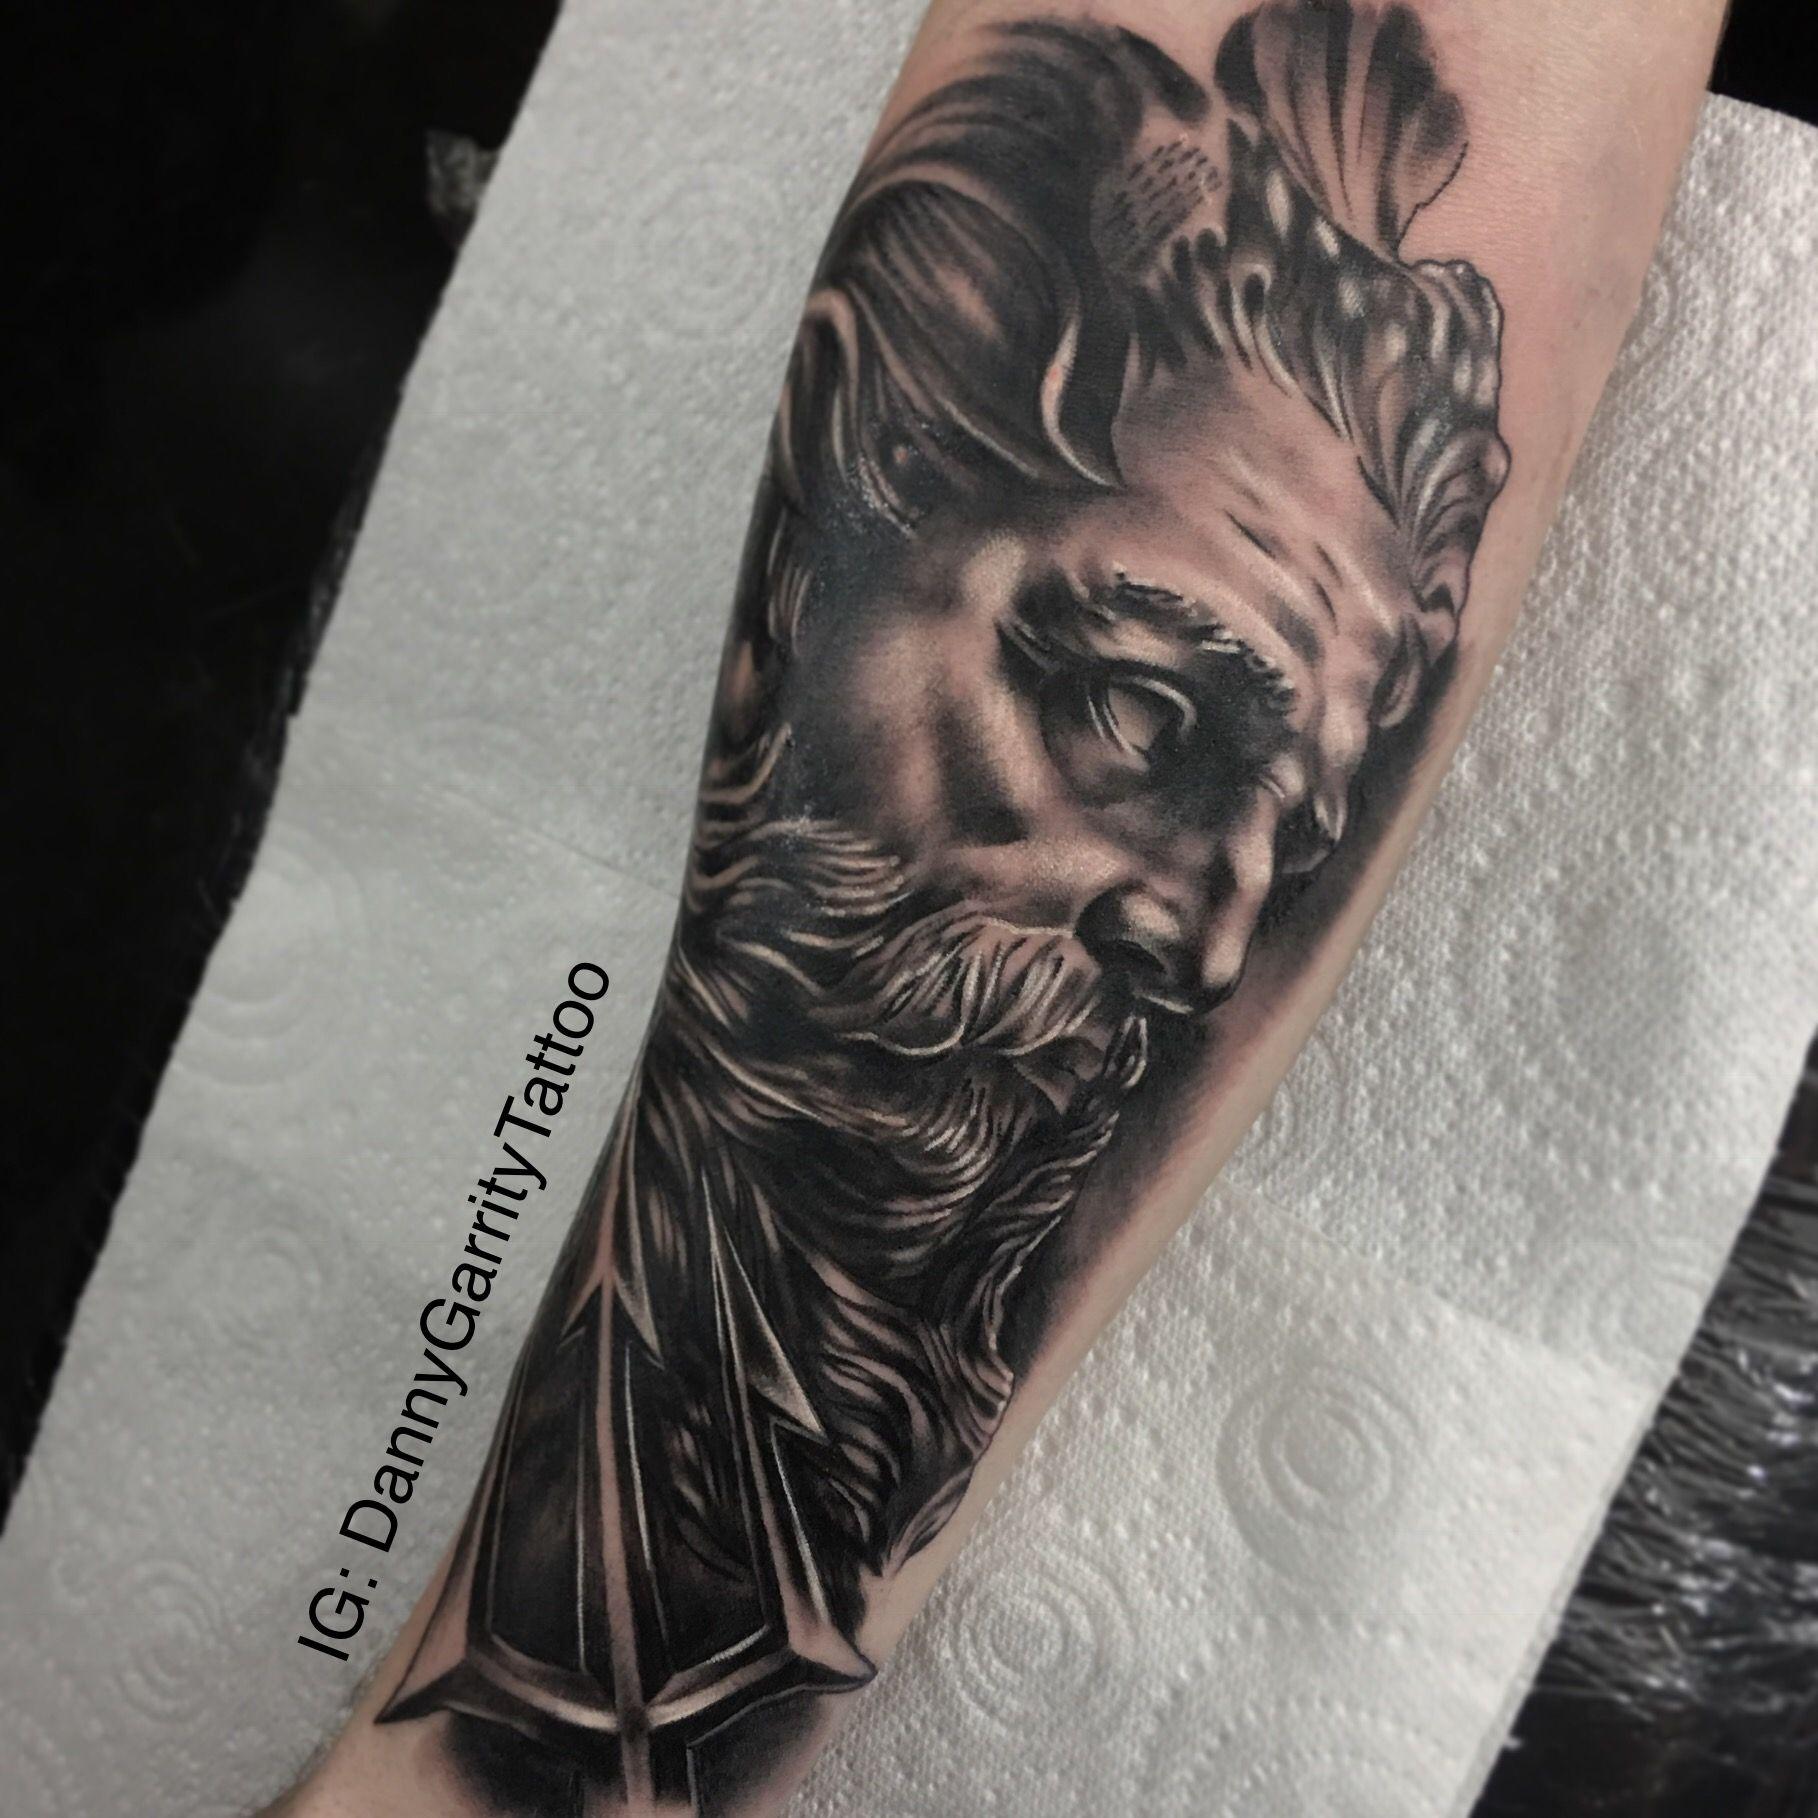 Black And Grey Greek Mythology Zeus Tattoo Sleeve Black And Grey